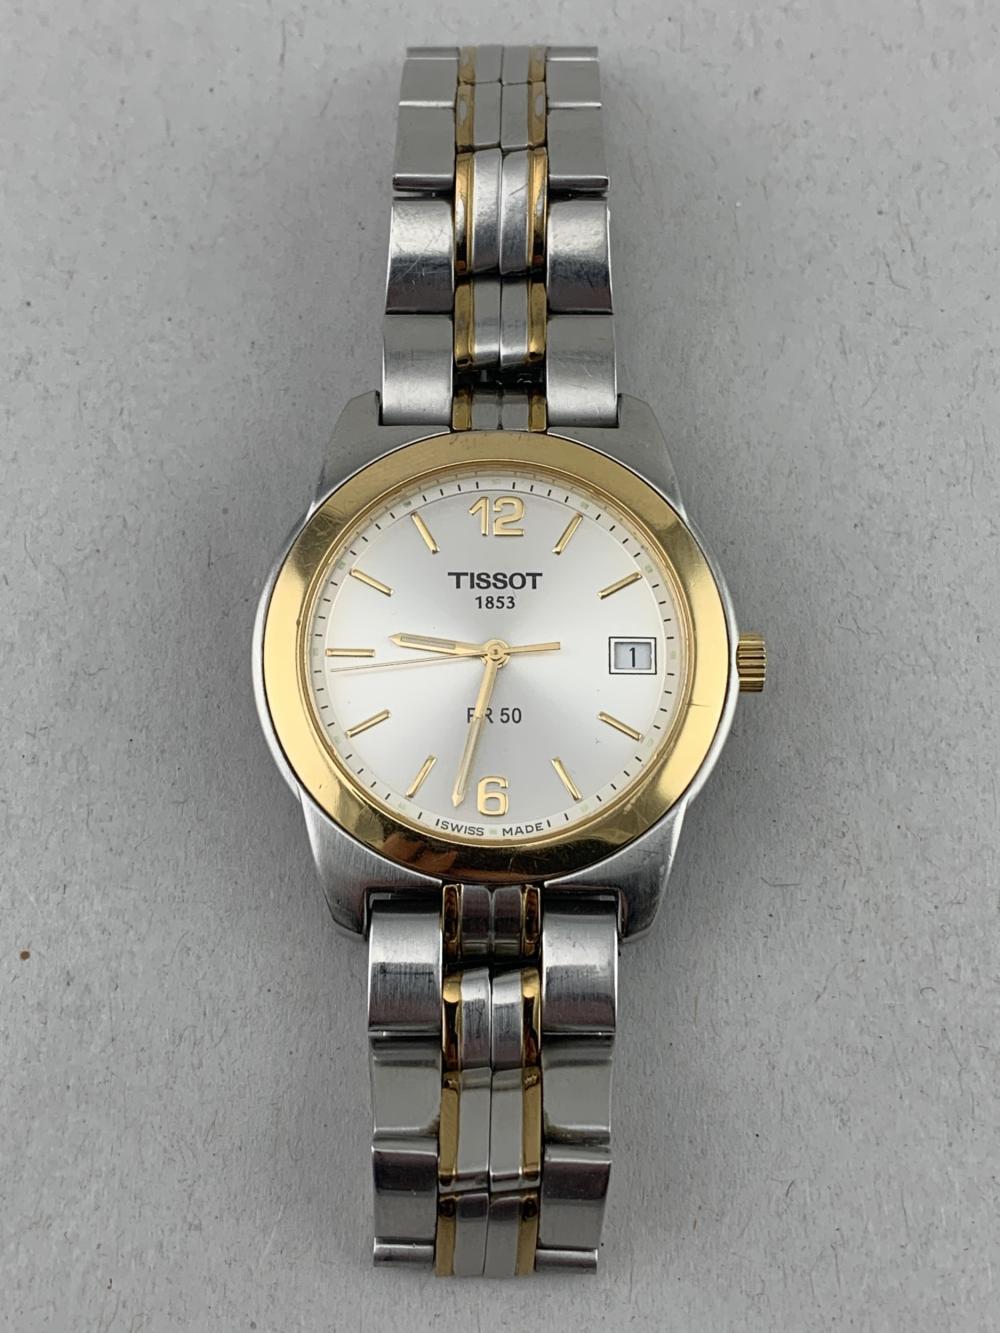 Tissot 1853 Pr 50 Mens Stainless Steel Wrist Watch